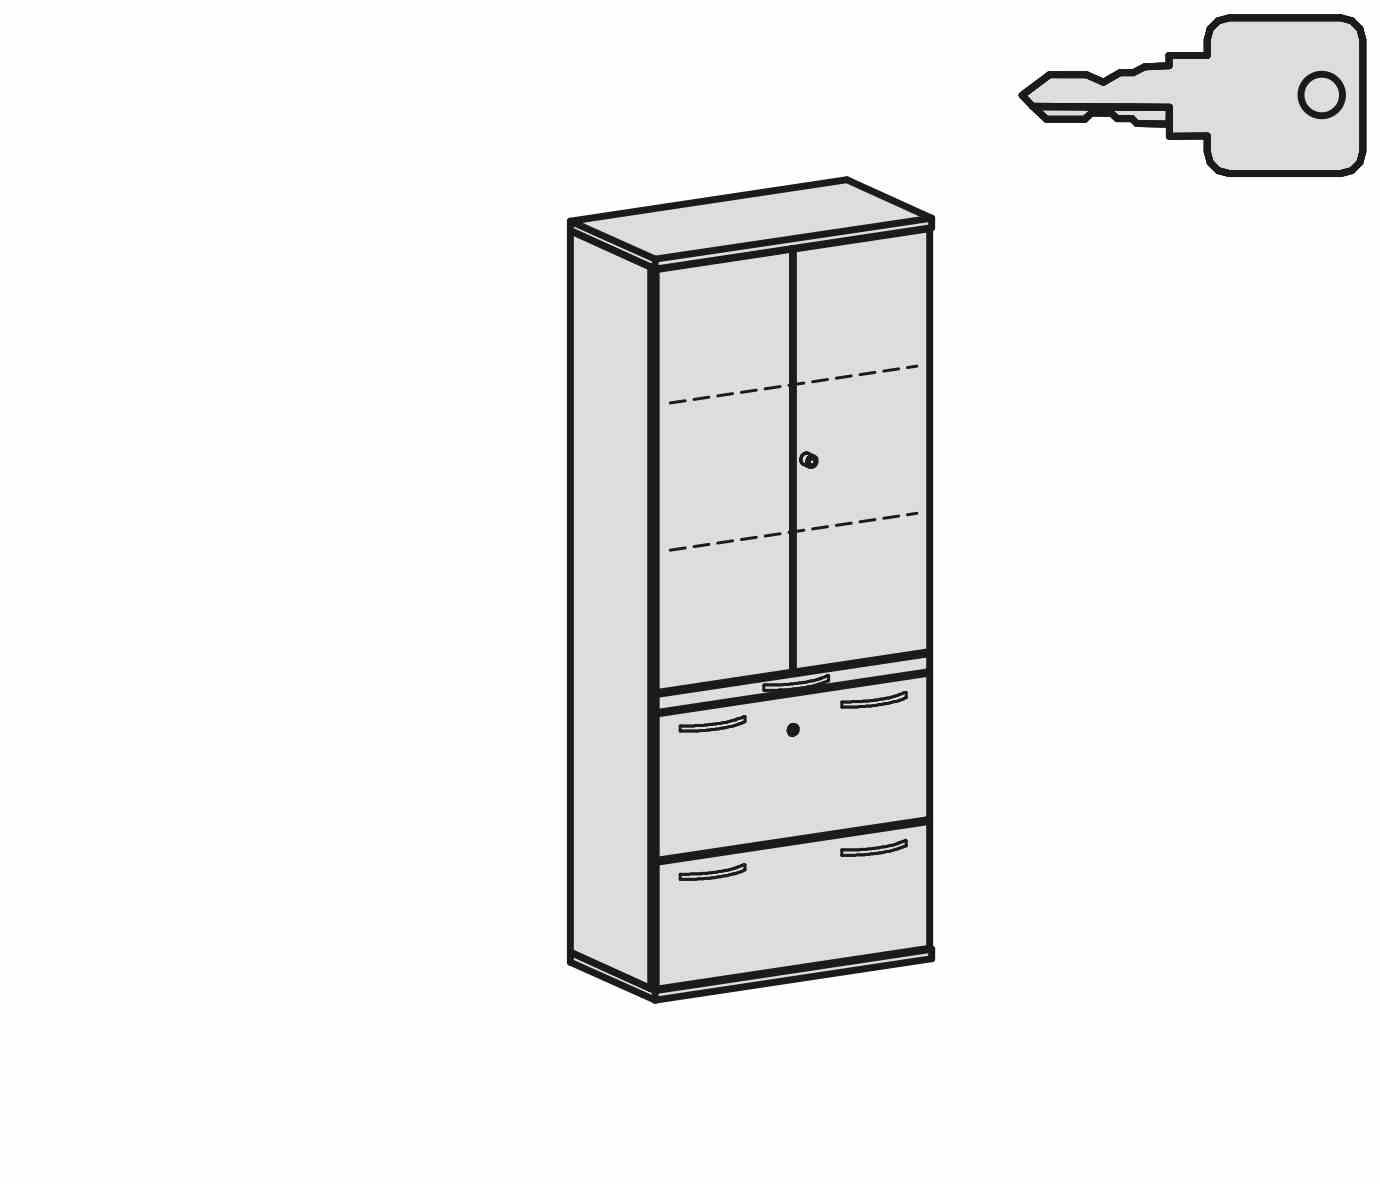 schrank 80 cm hoch full size of badezimmer schrank cm. Black Bedroom Furniture Sets. Home Design Ideas